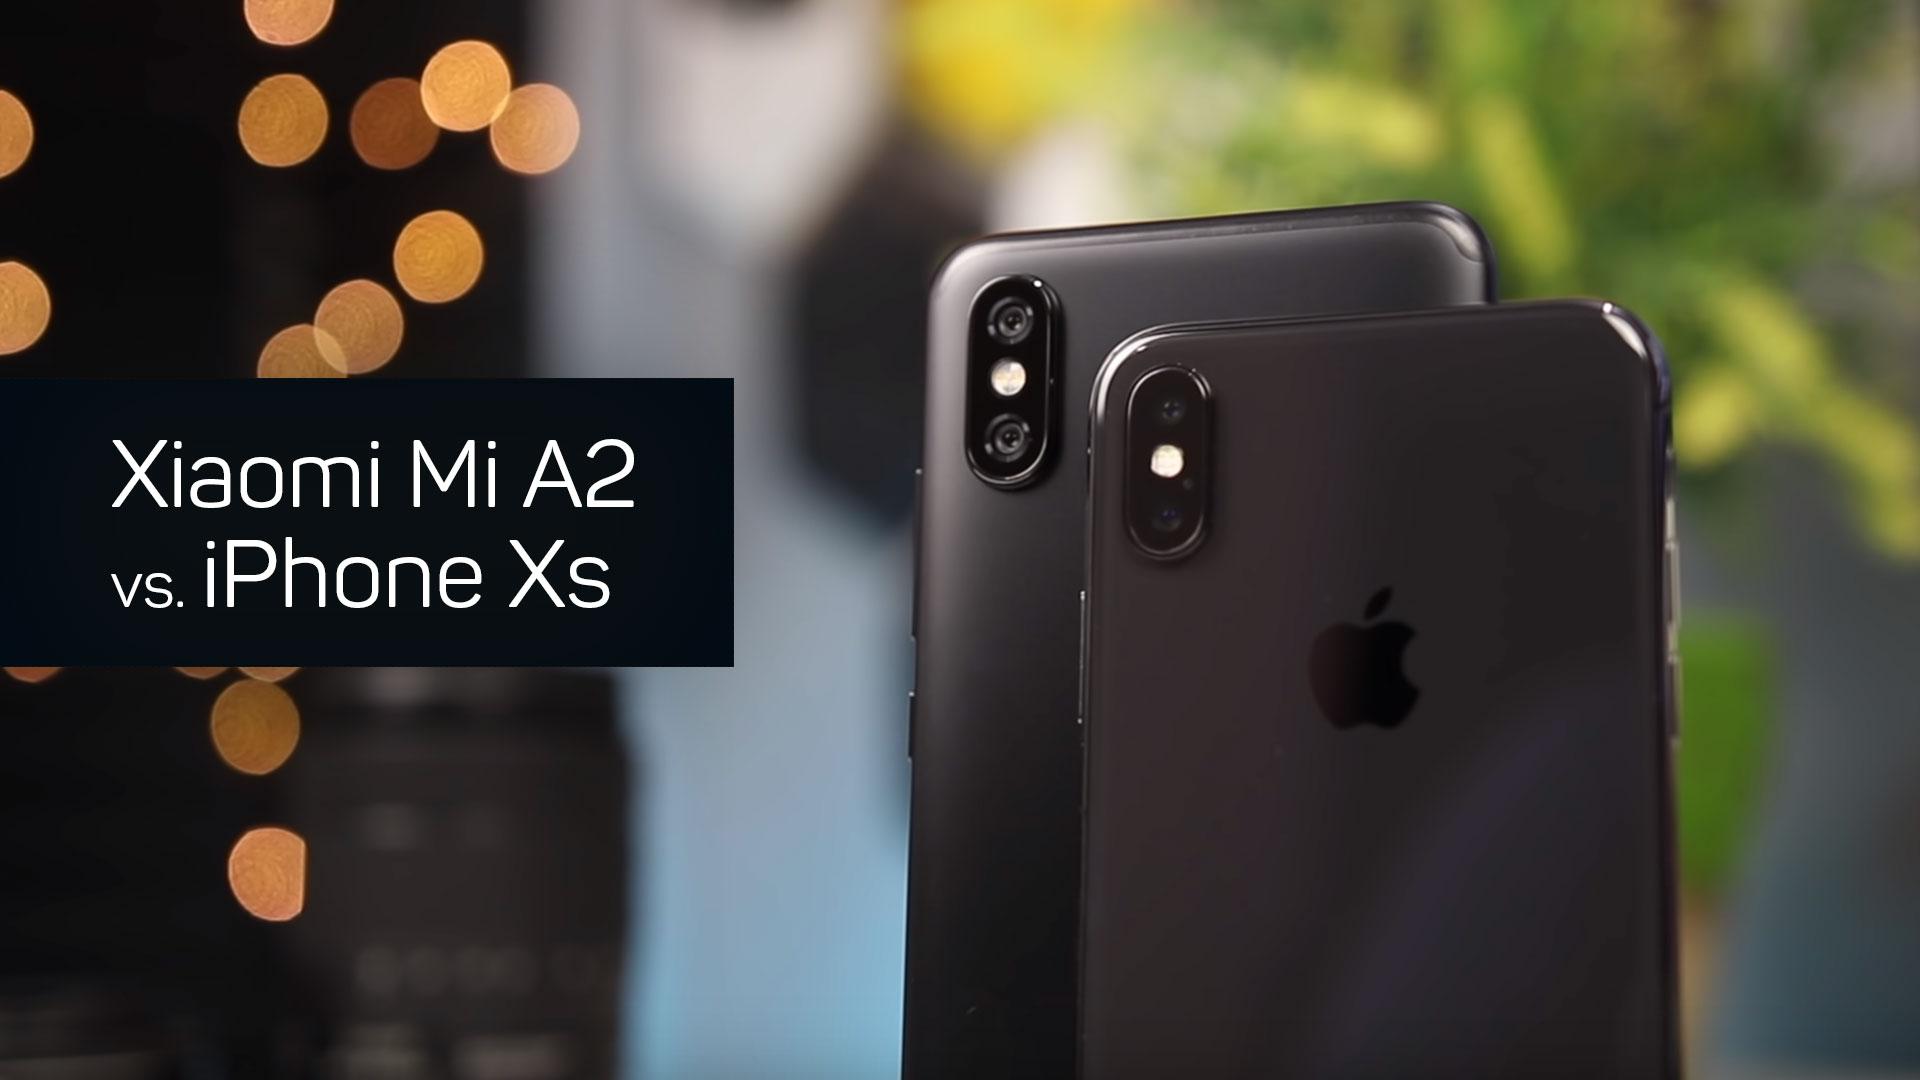 Porovnanie iPhone Xs vs Xioami Mi A2